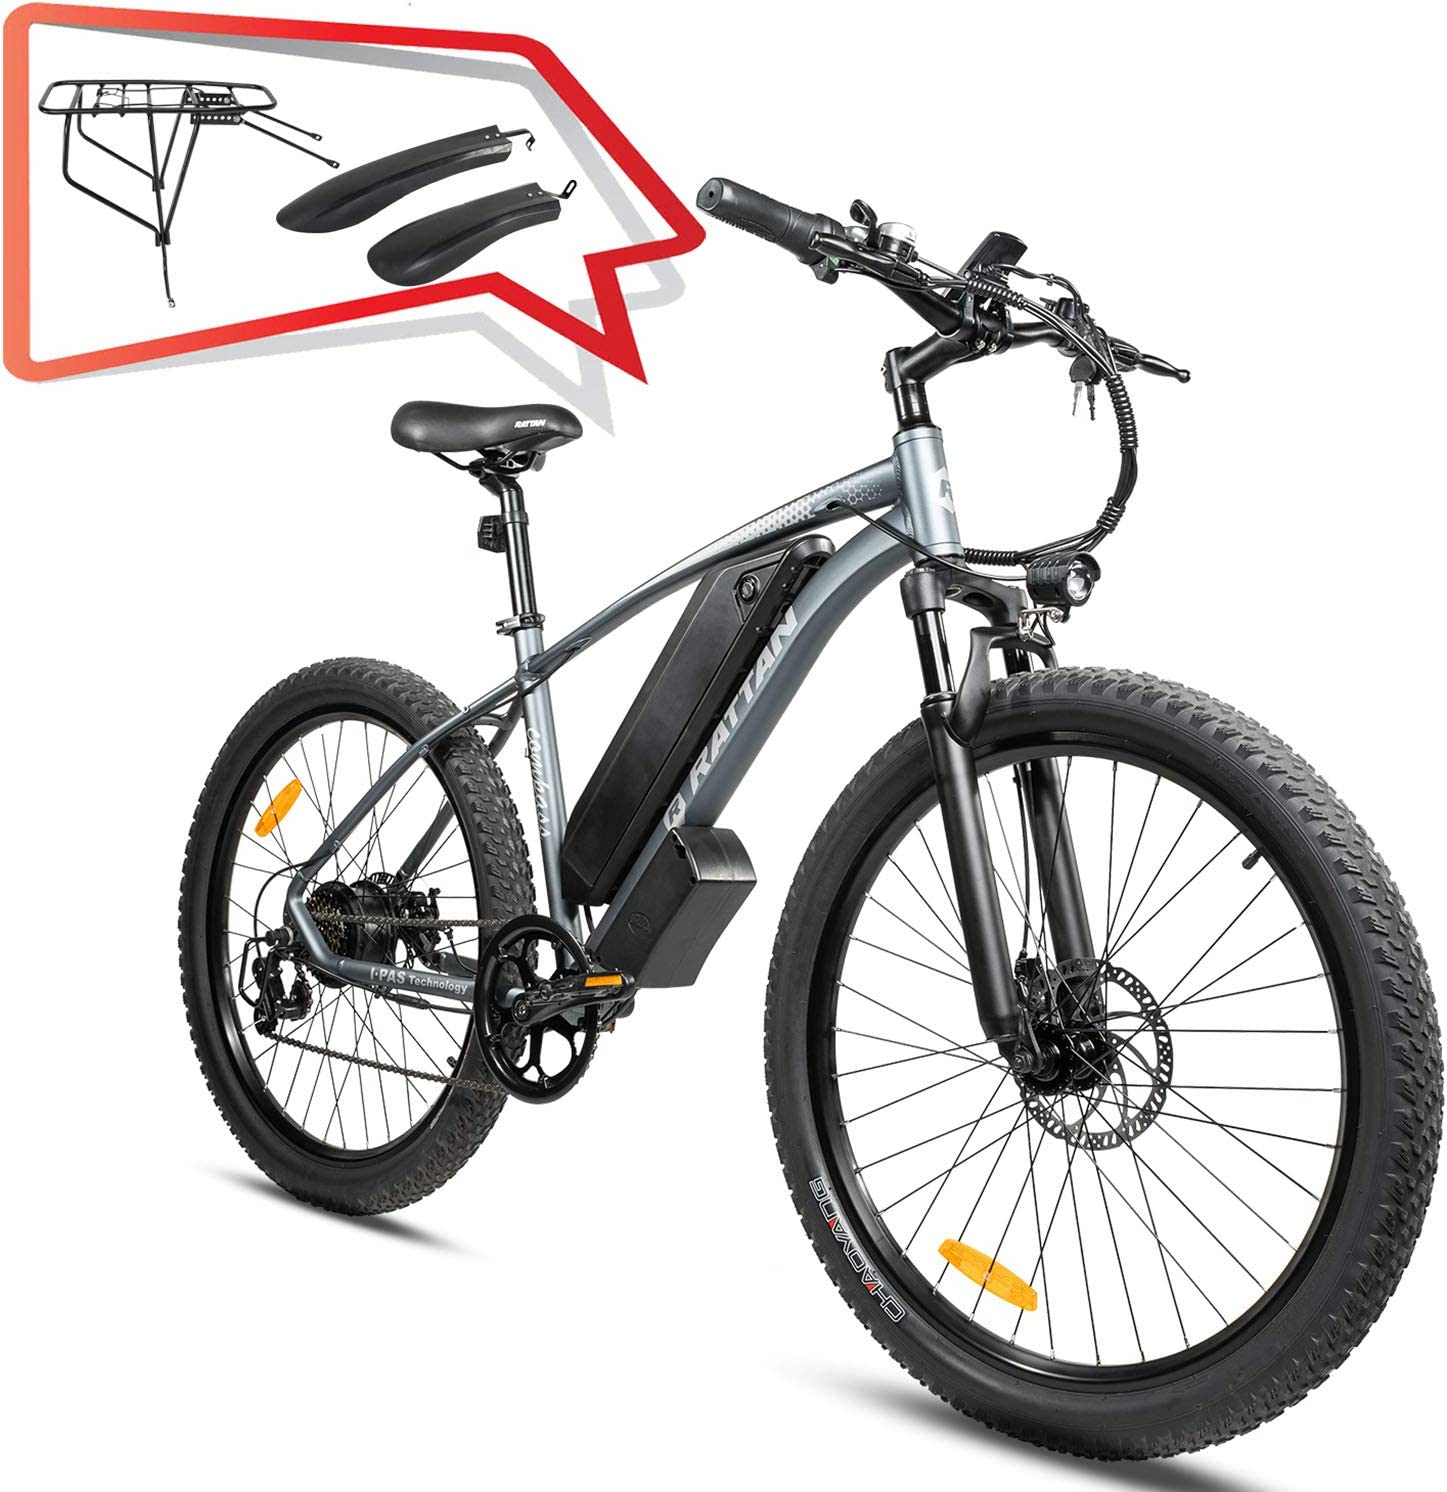 R Ratan electric mountain bike